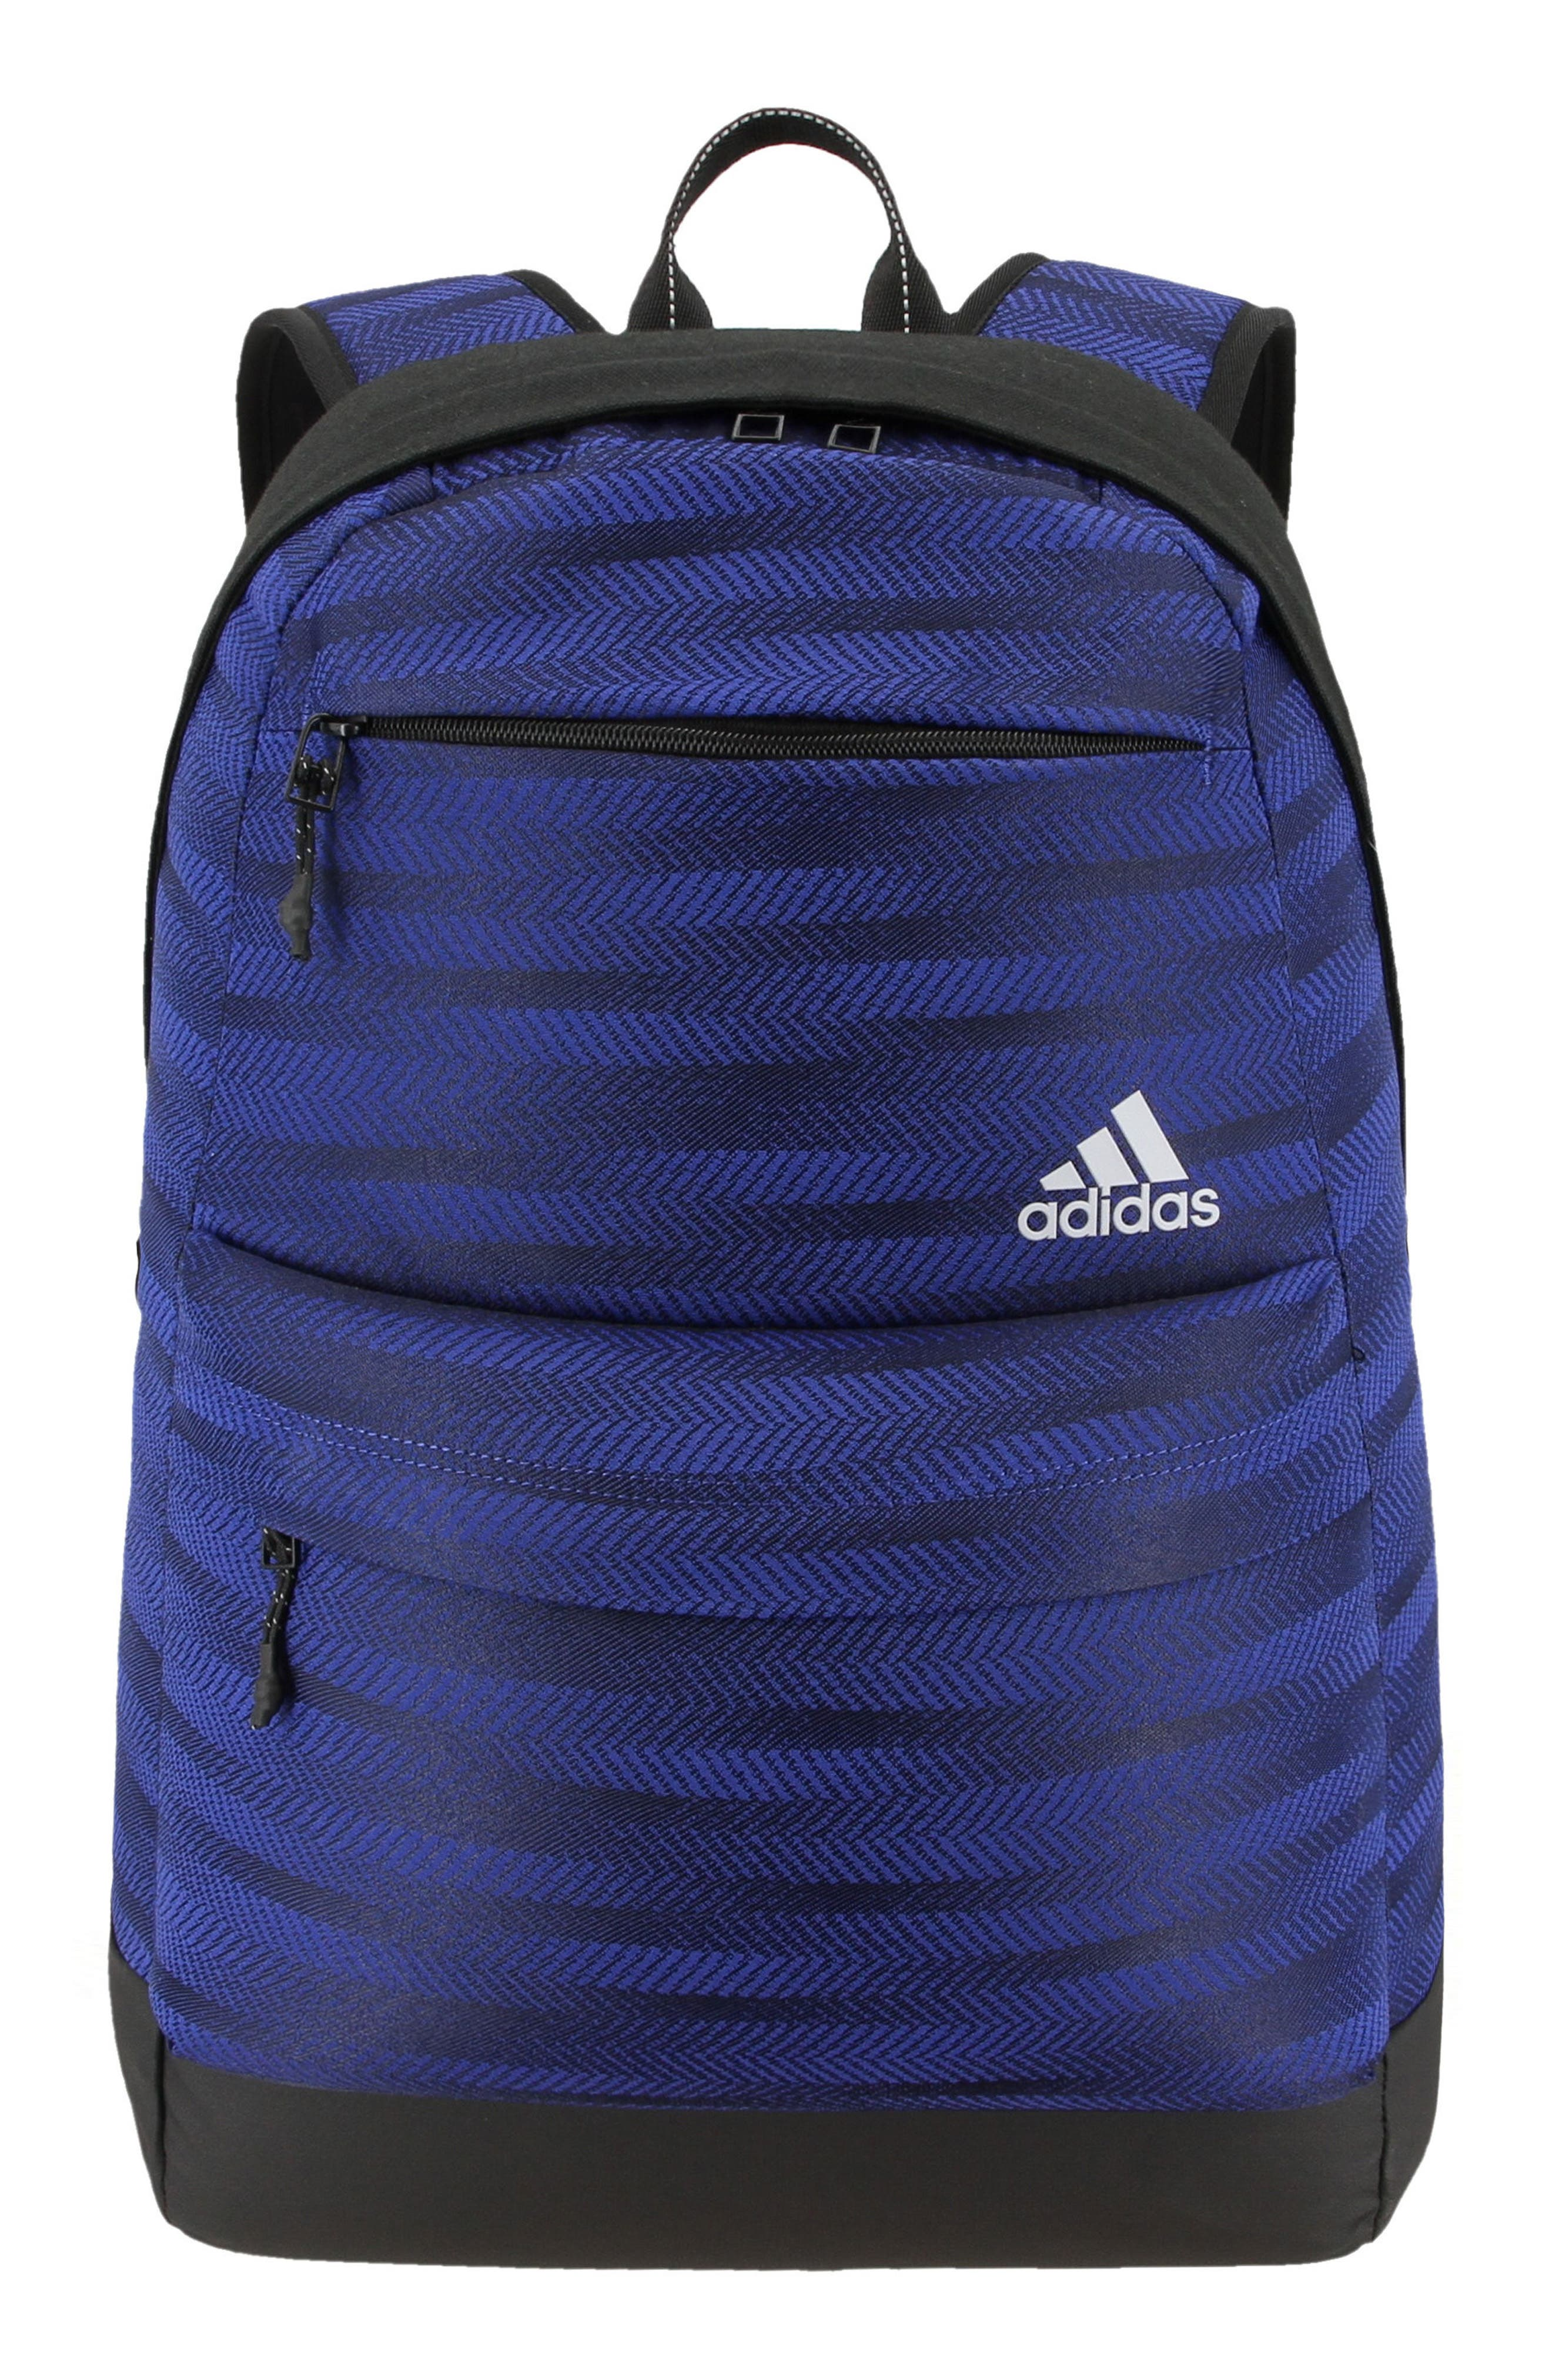 Alternate Image 1 Selected - adidas Originals Daybreak Backpack